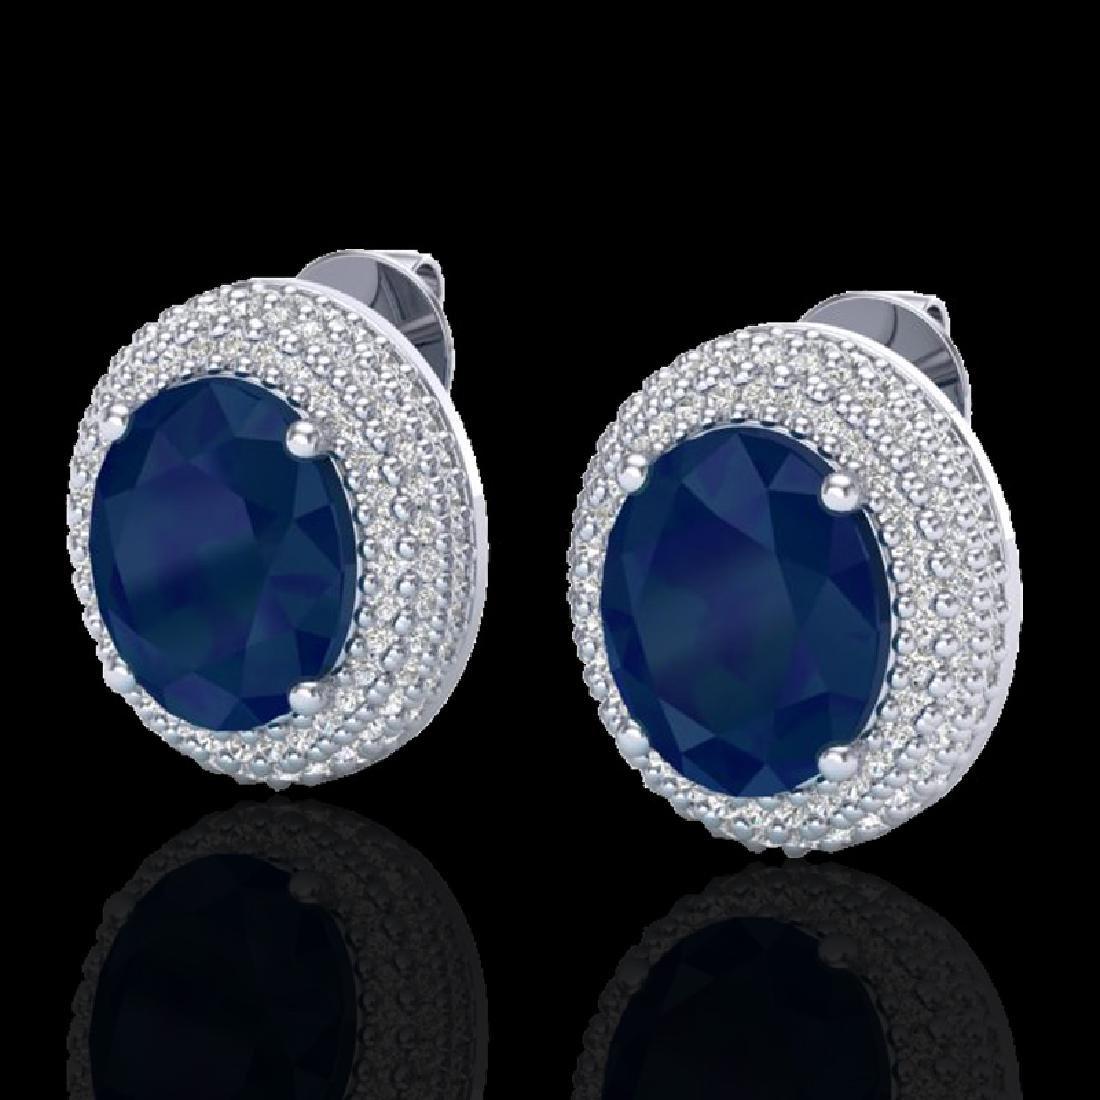 9.20 CTW Sapphire & Micro Pave VS/SI Diamond Earrings